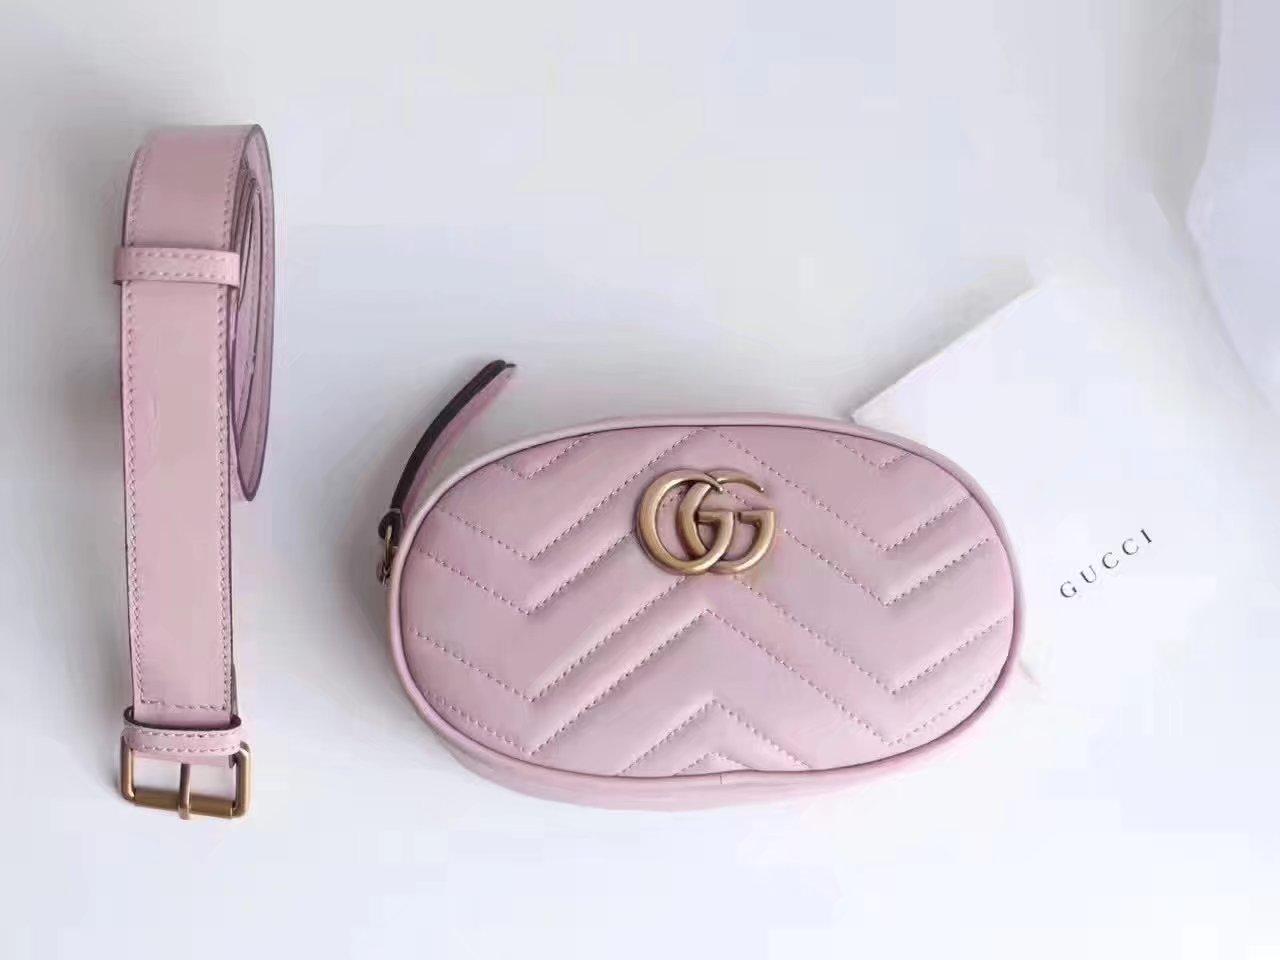 Gucci 476434 GG Marmont Matelassé Leather Belt Bag Pink